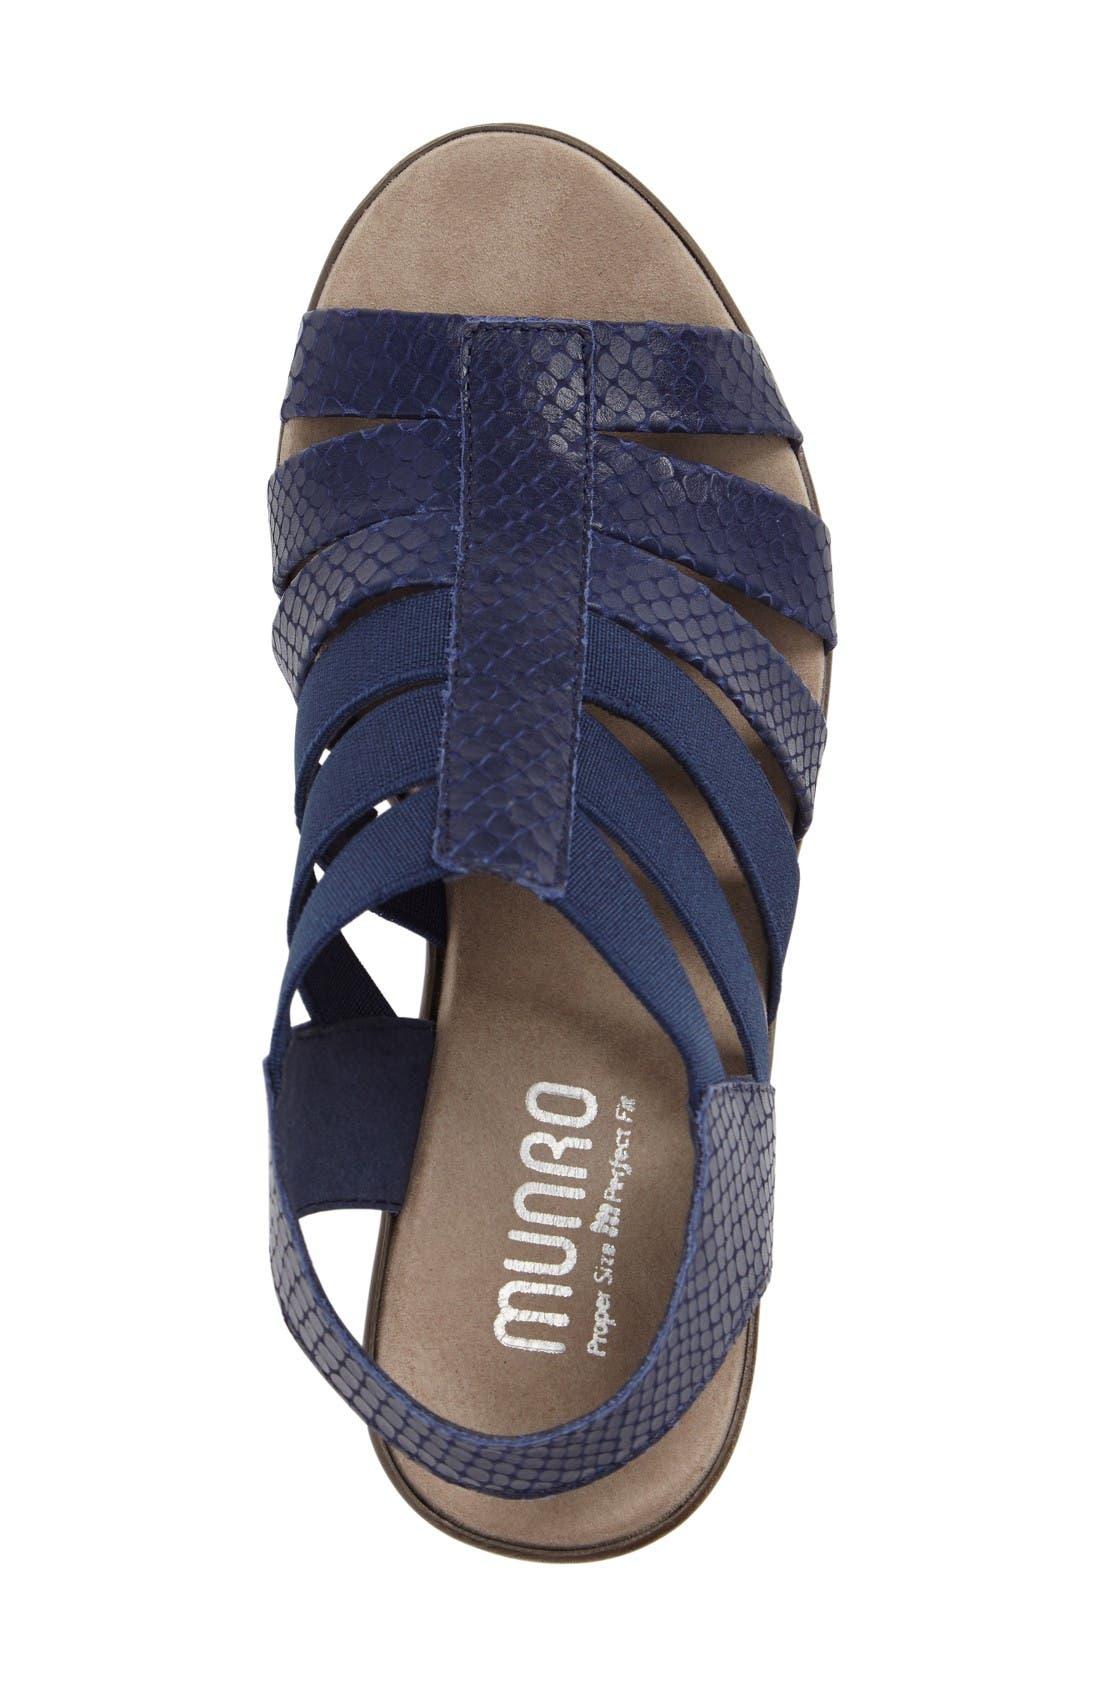 Alternate Image 3  - Munro 'Cookie' Slingback Sandal (Women)